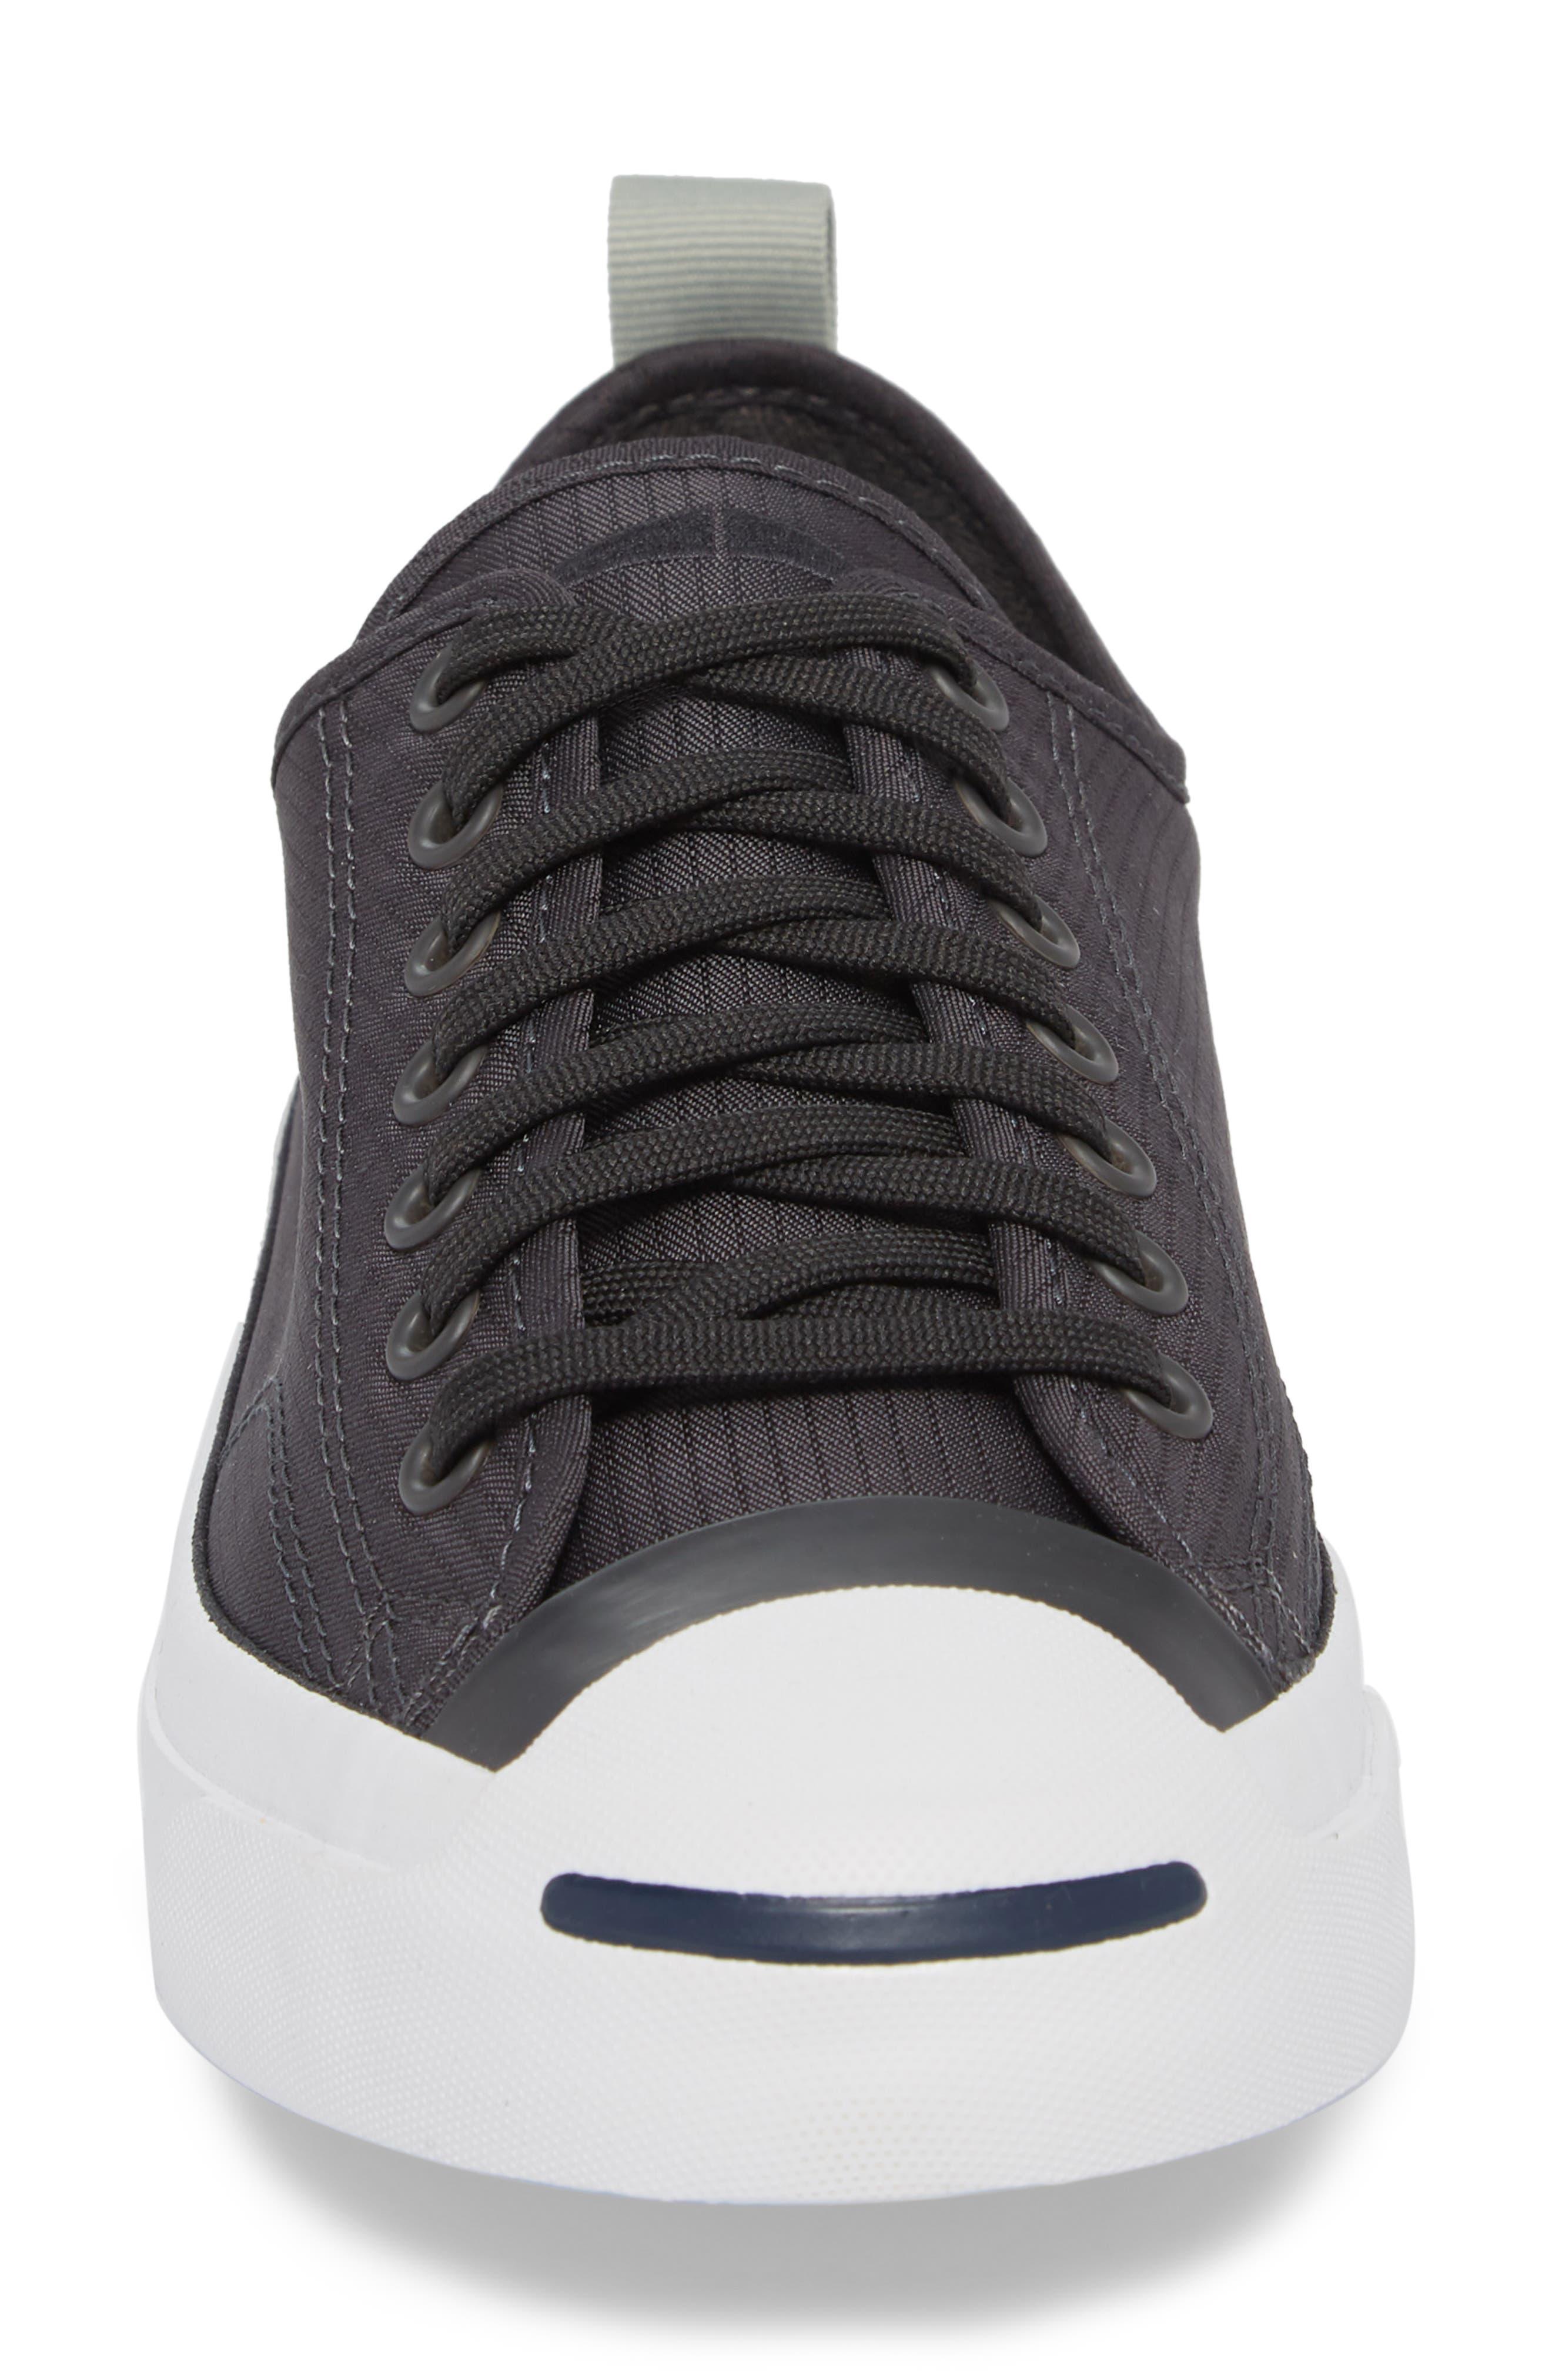 Jack Purcell Ripstop Sneaker,                             Alternate thumbnail 4, color,                             Black